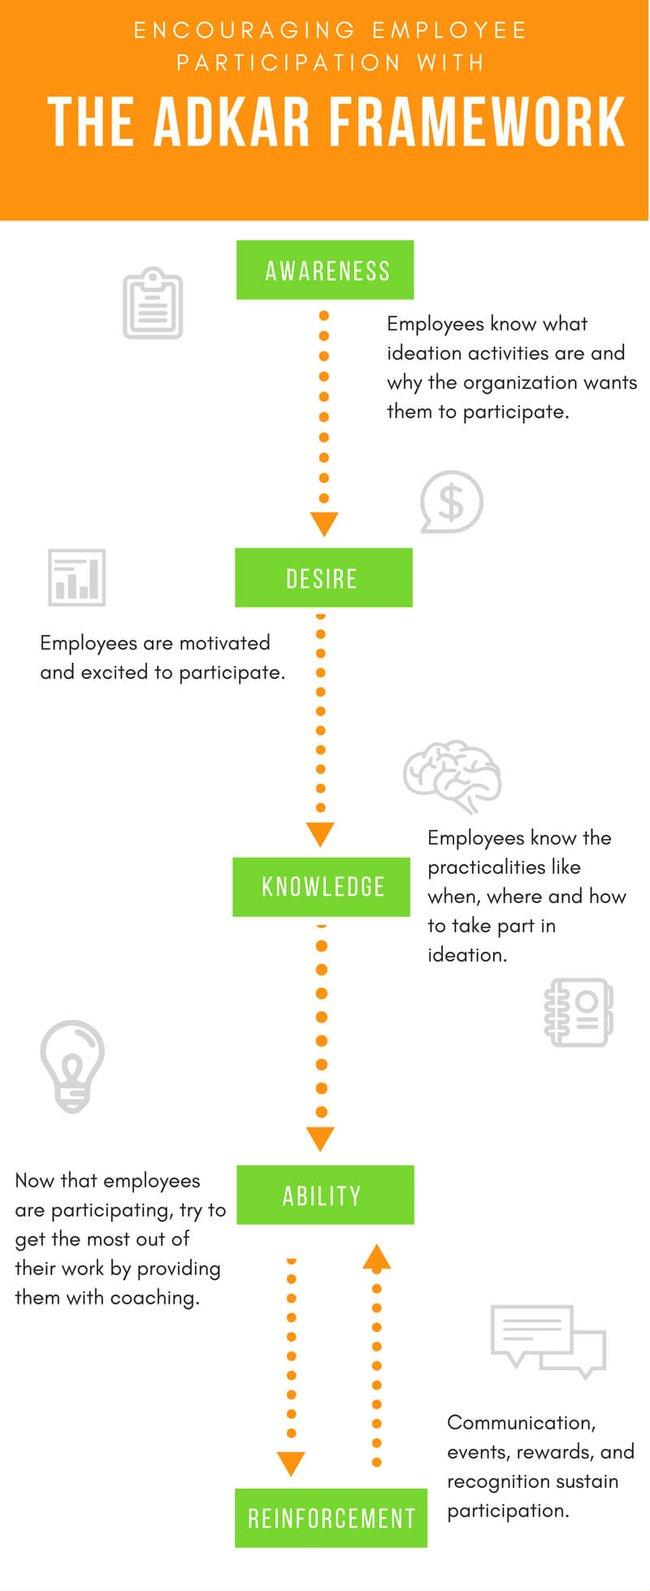 The ADKAR Framework